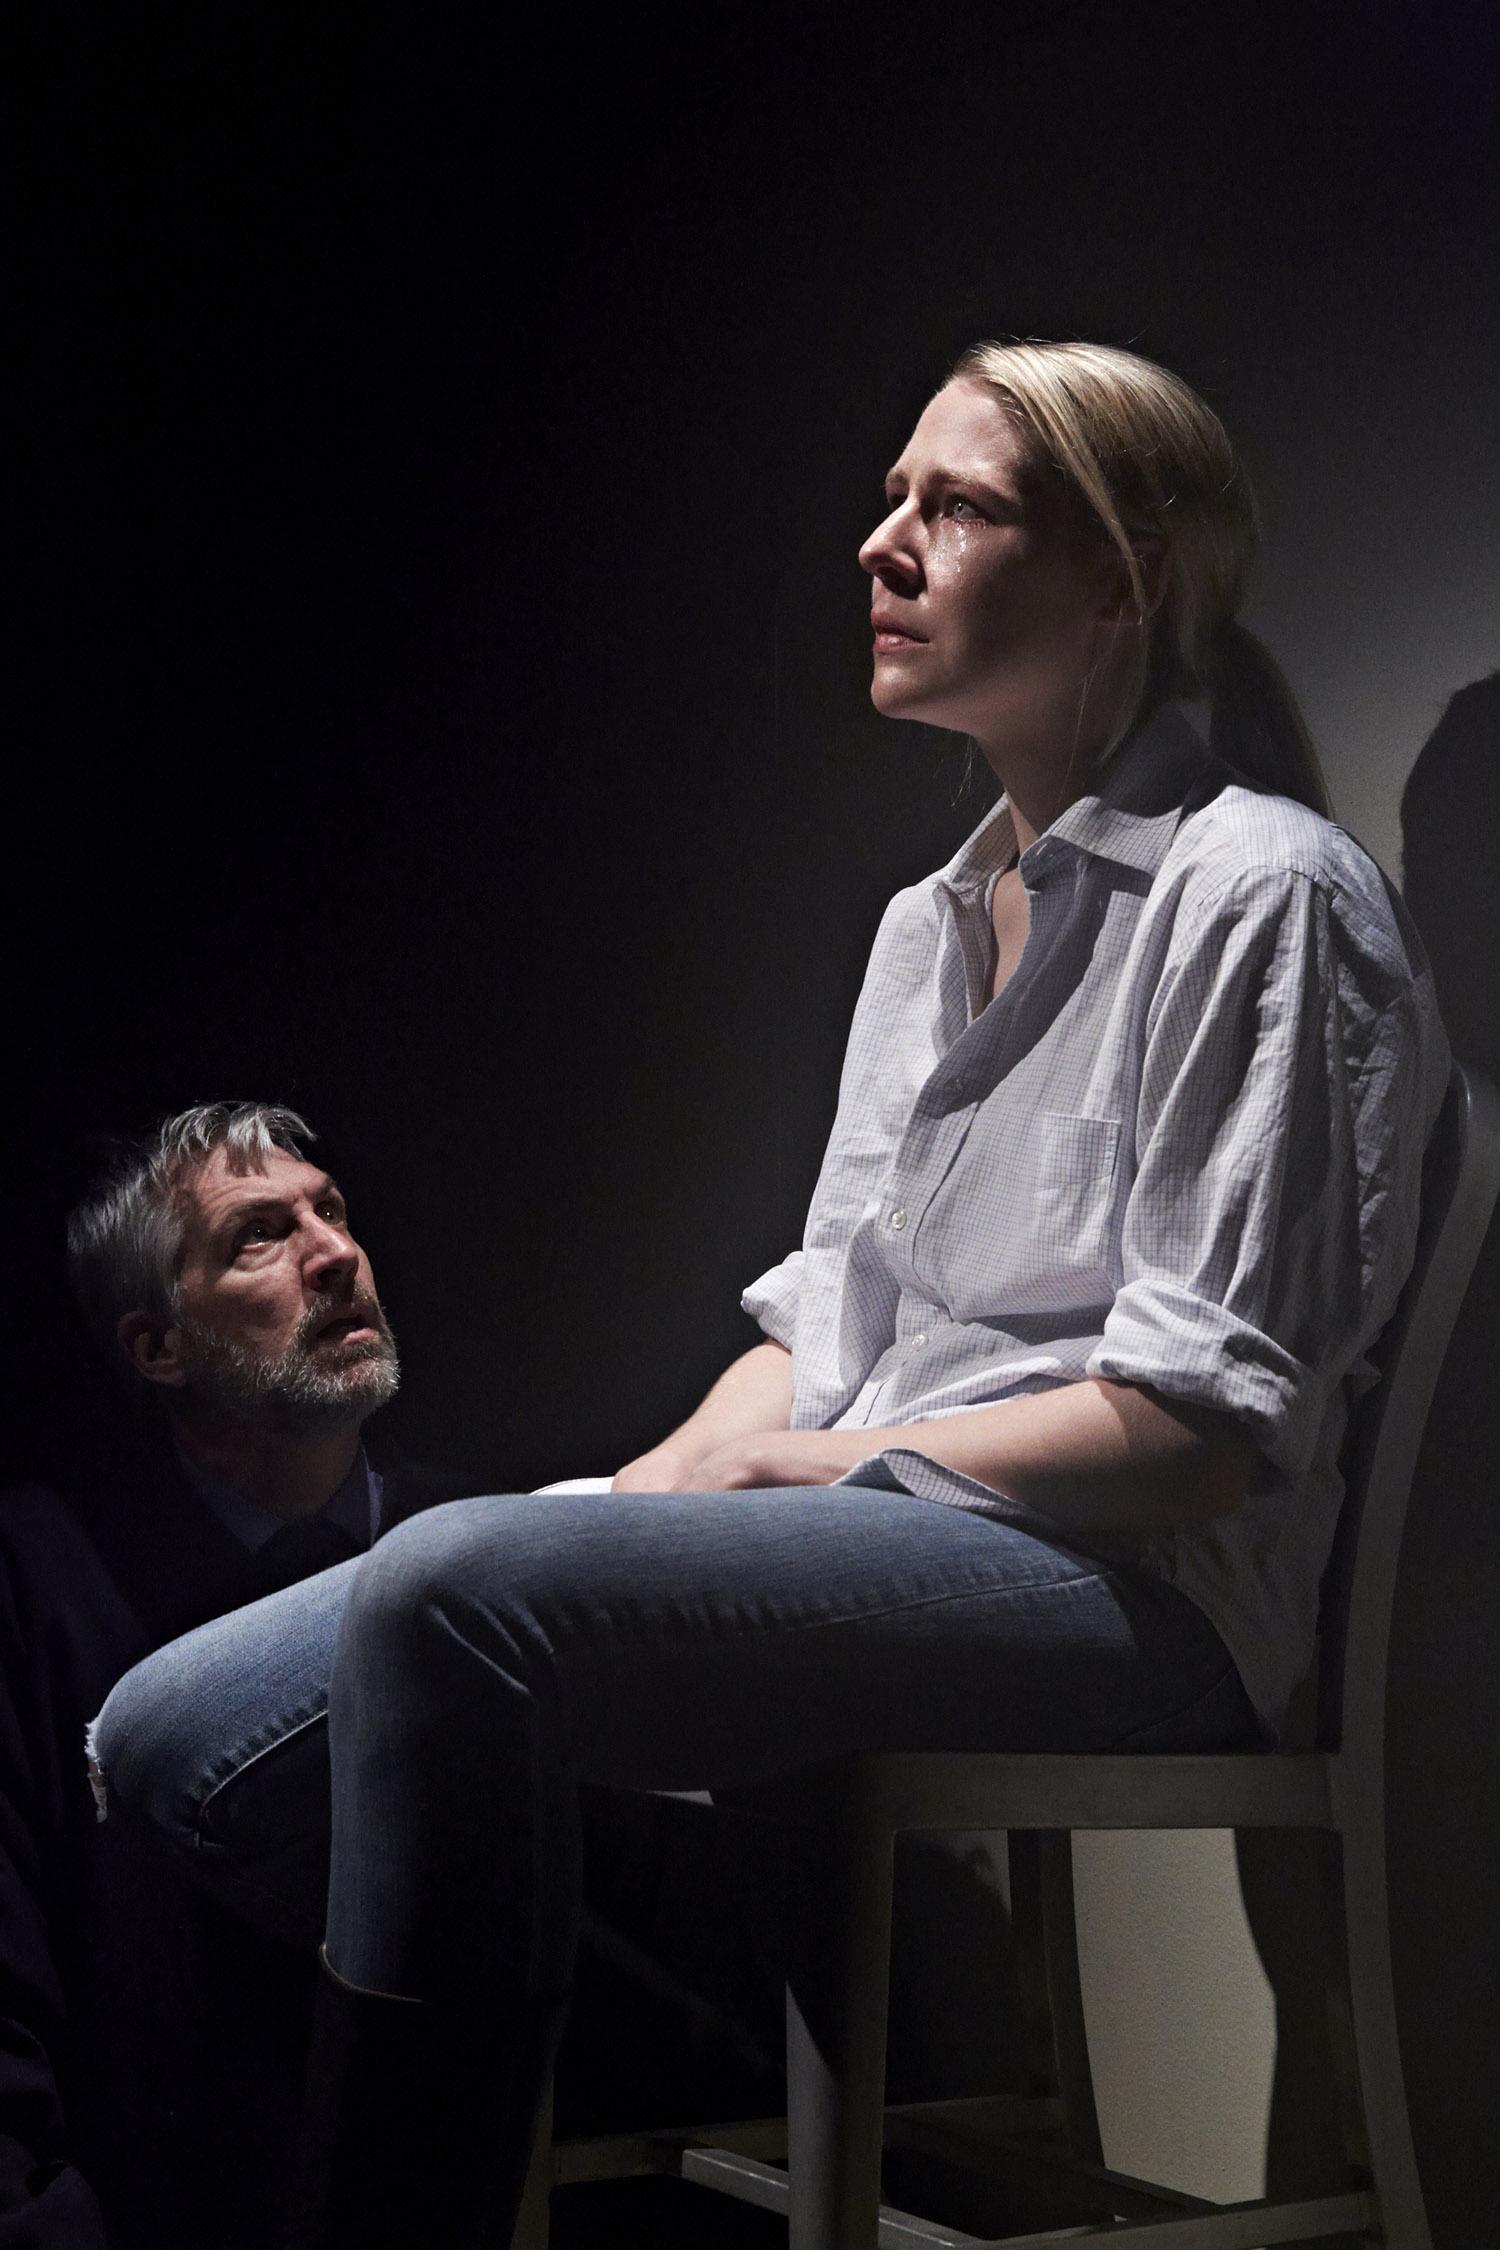 Stephan Wolfert and Samantha Steinmetz. Lighting Designer Christina Giannelli.